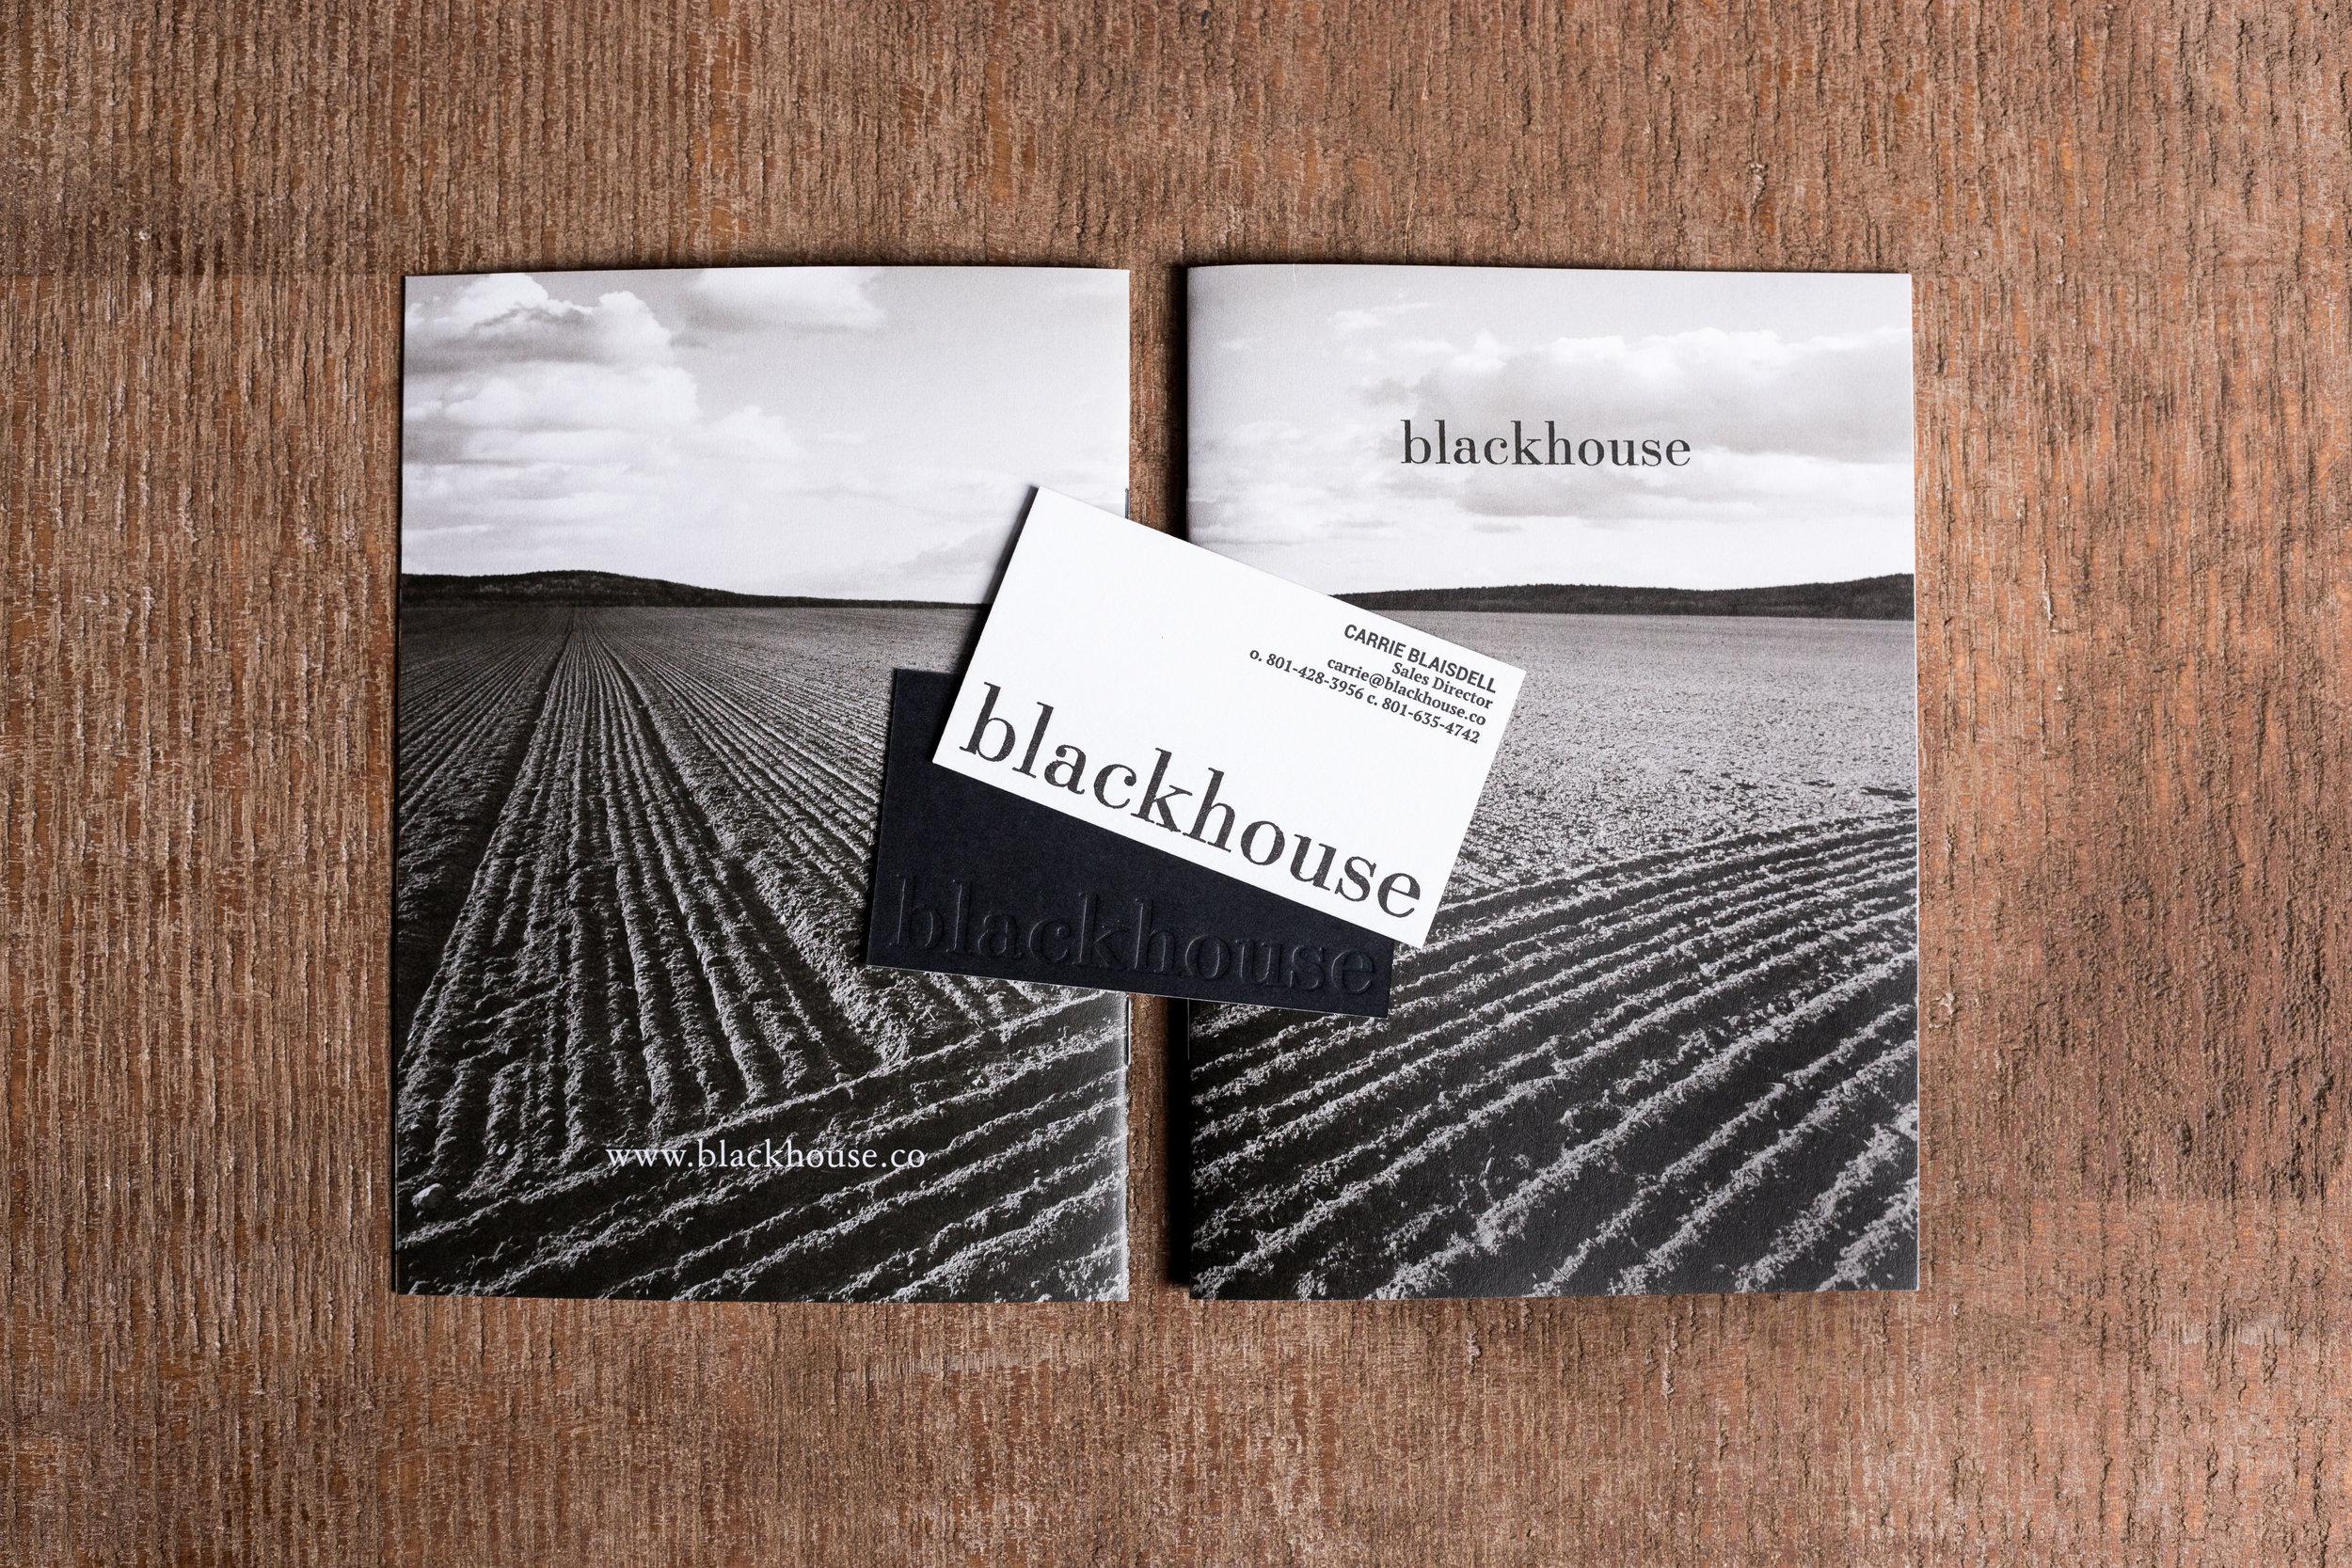 Blackhouse_LookBook+BusinessCard-1.jpg